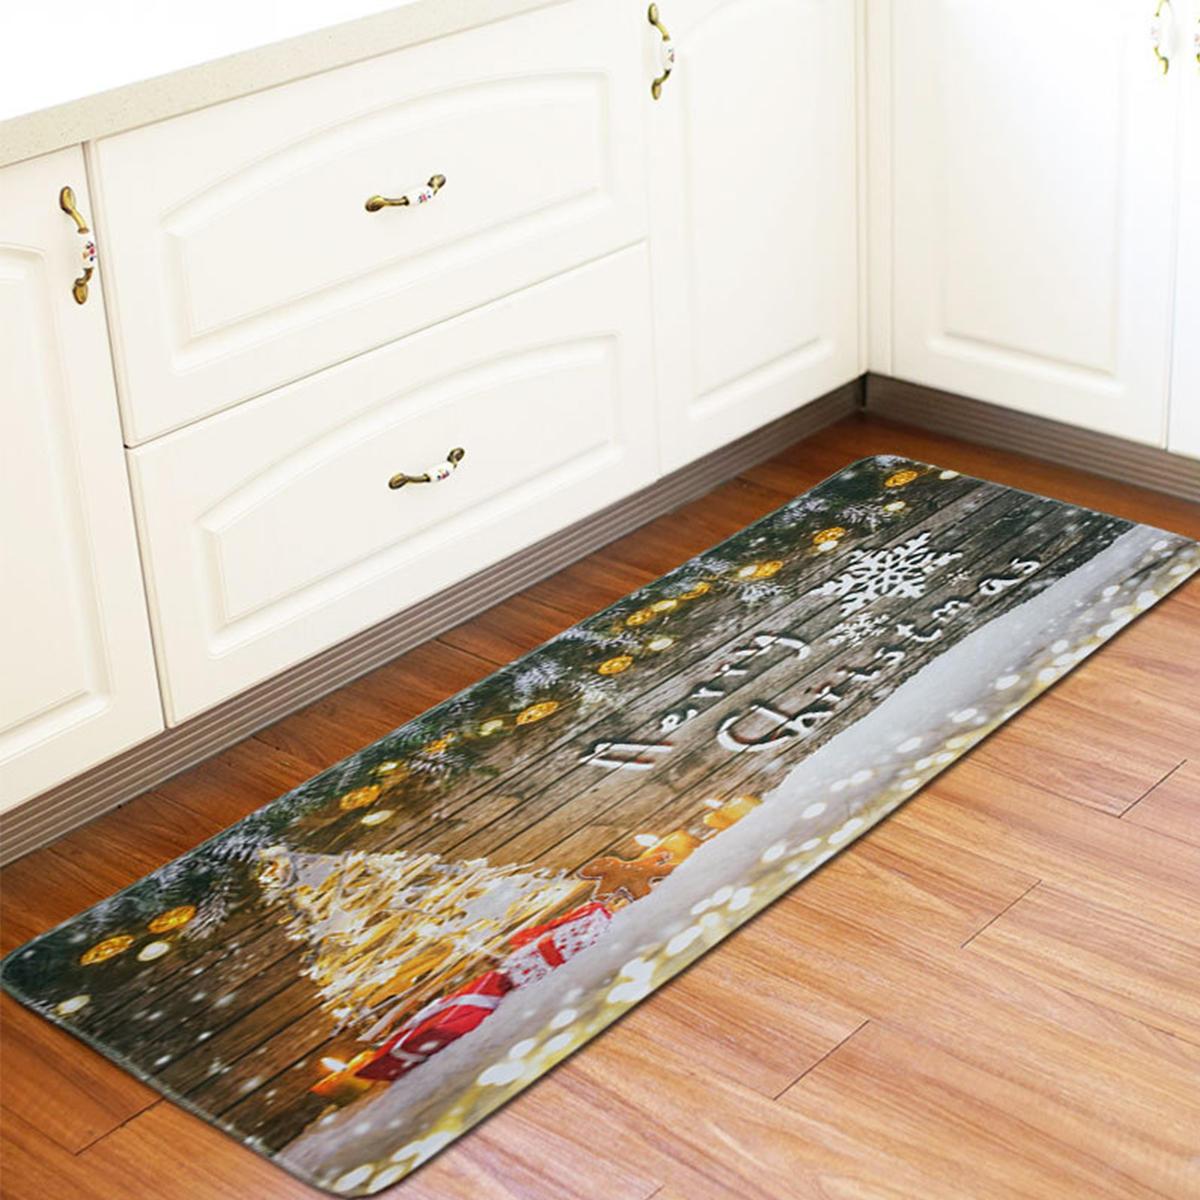 60 X 170cm Anti Skid Christmas Area Rugs Carpet Floor Mat Home Kitchen Bedroom